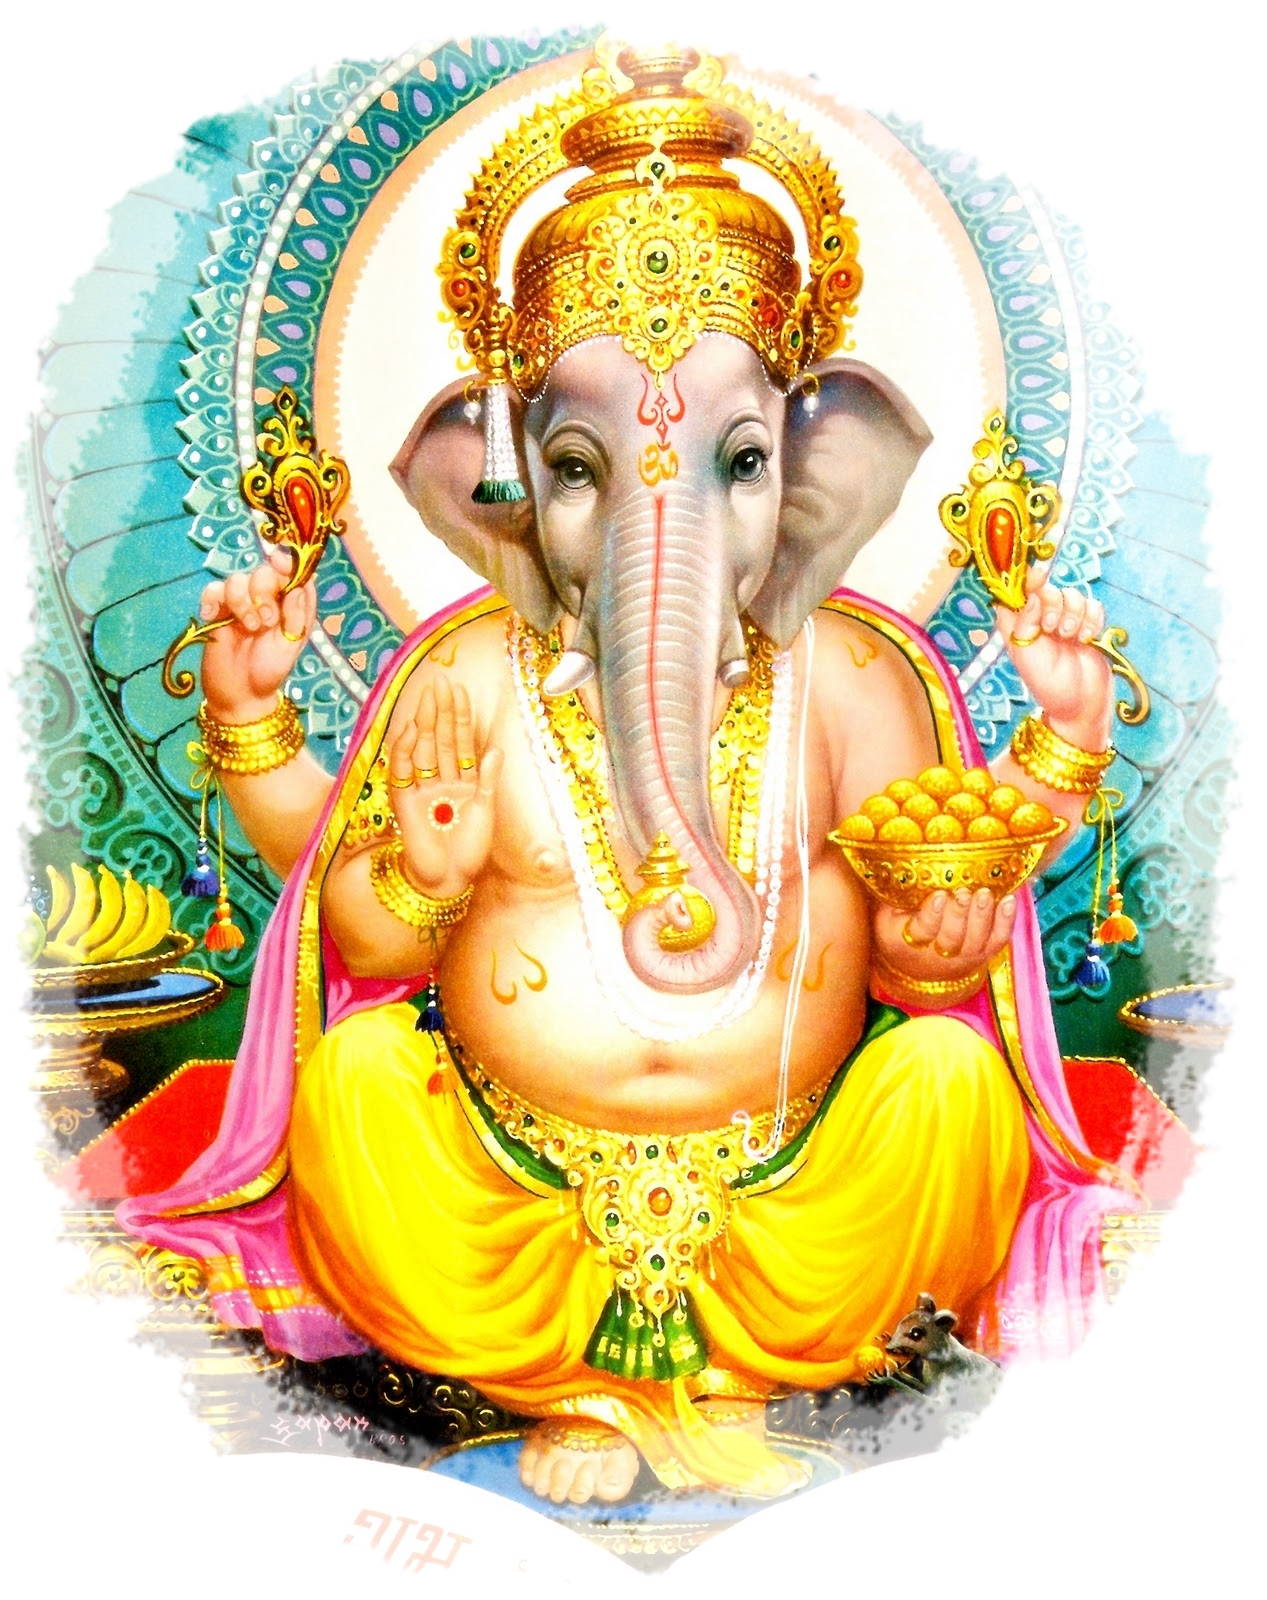 COMANDO OTXATE - Página 4 Lord+Ganesha2